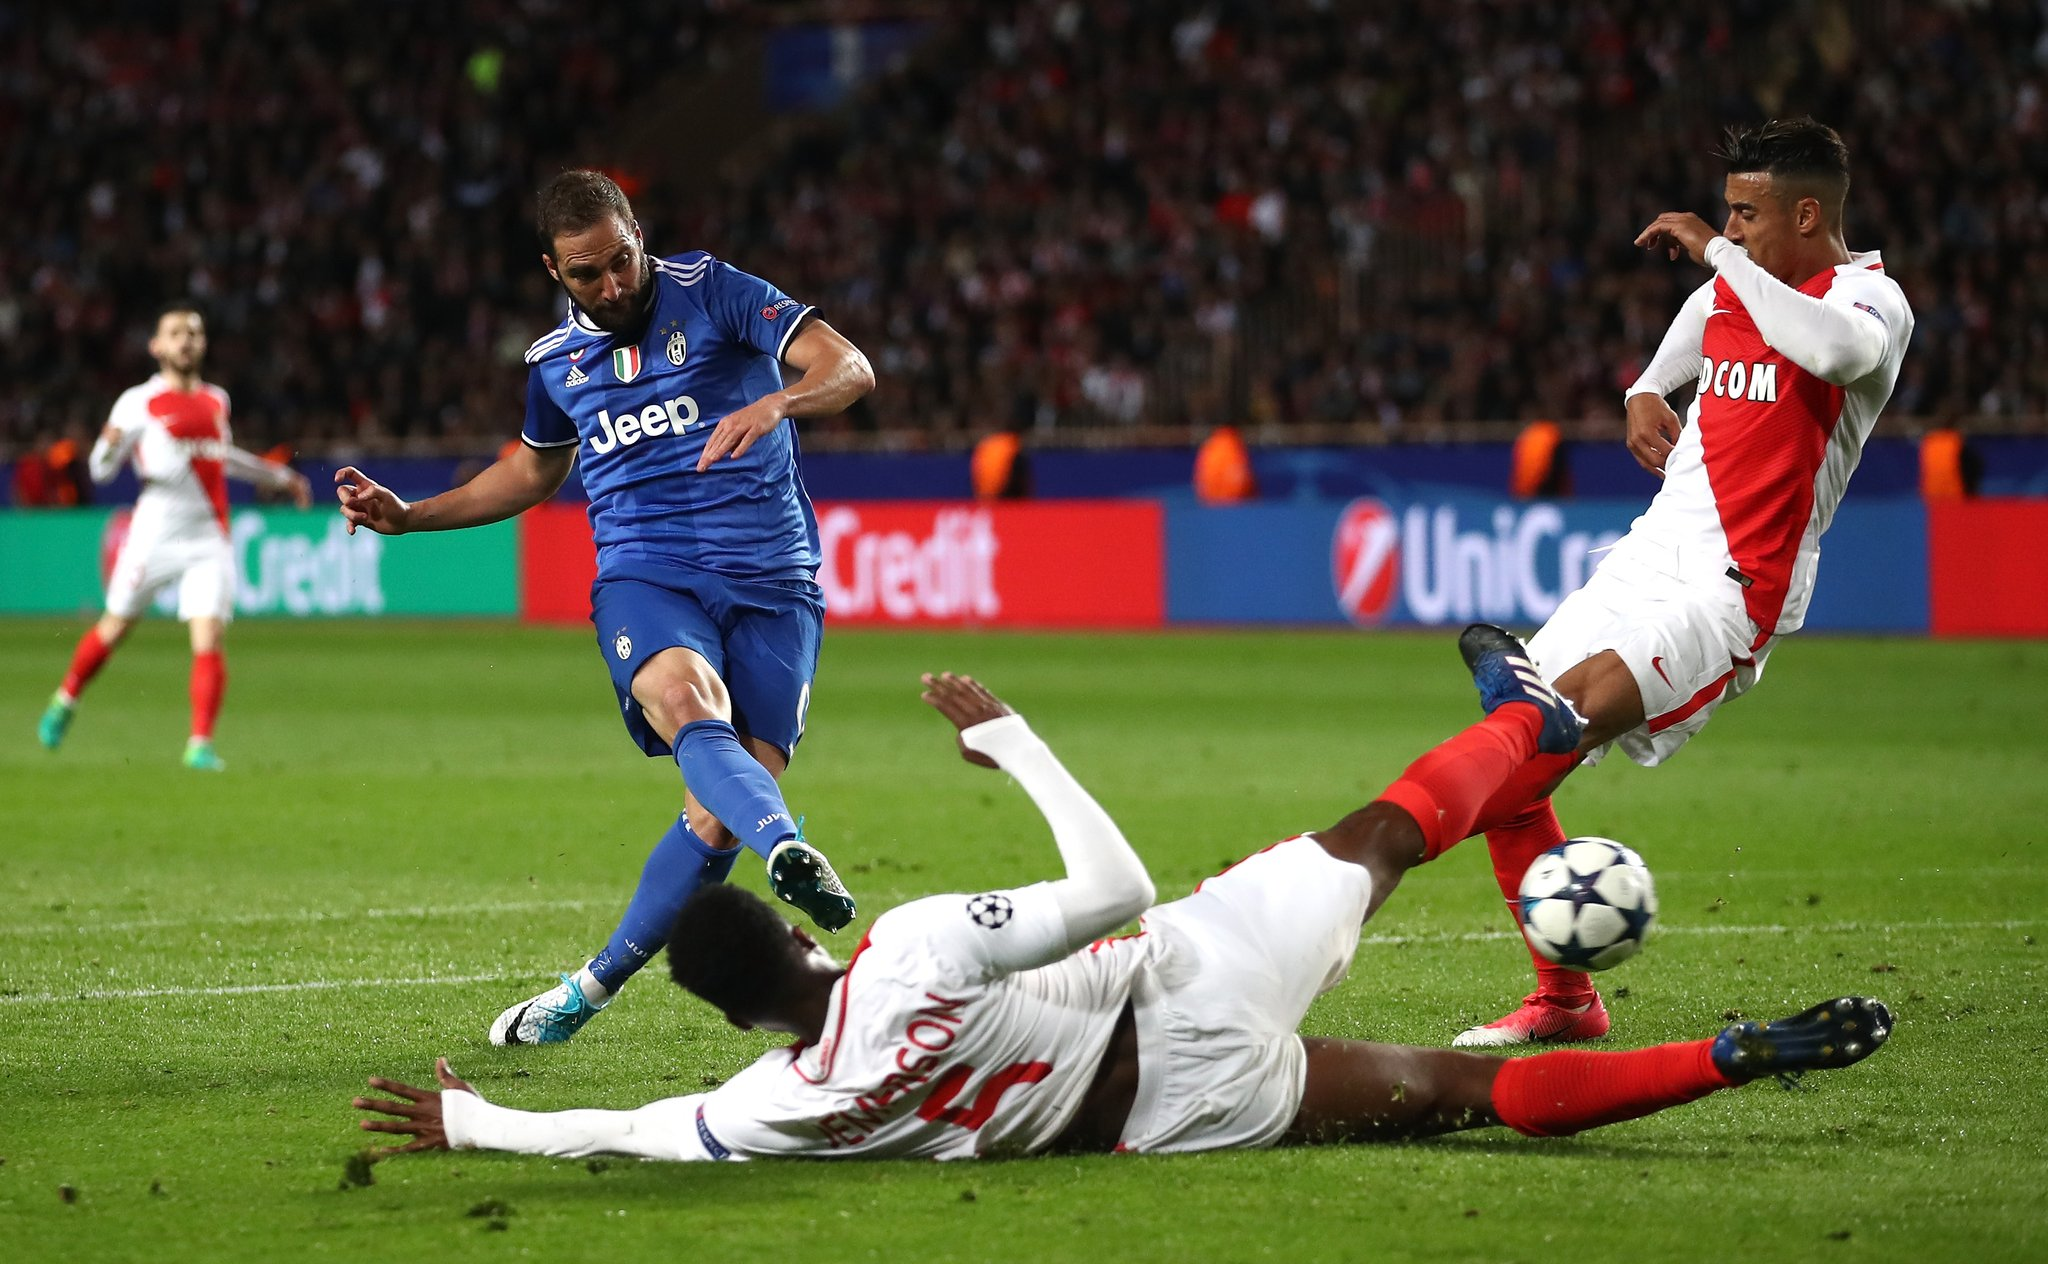 Higuain Bags Brace Vs Monaco As Juventus Near UCL Final